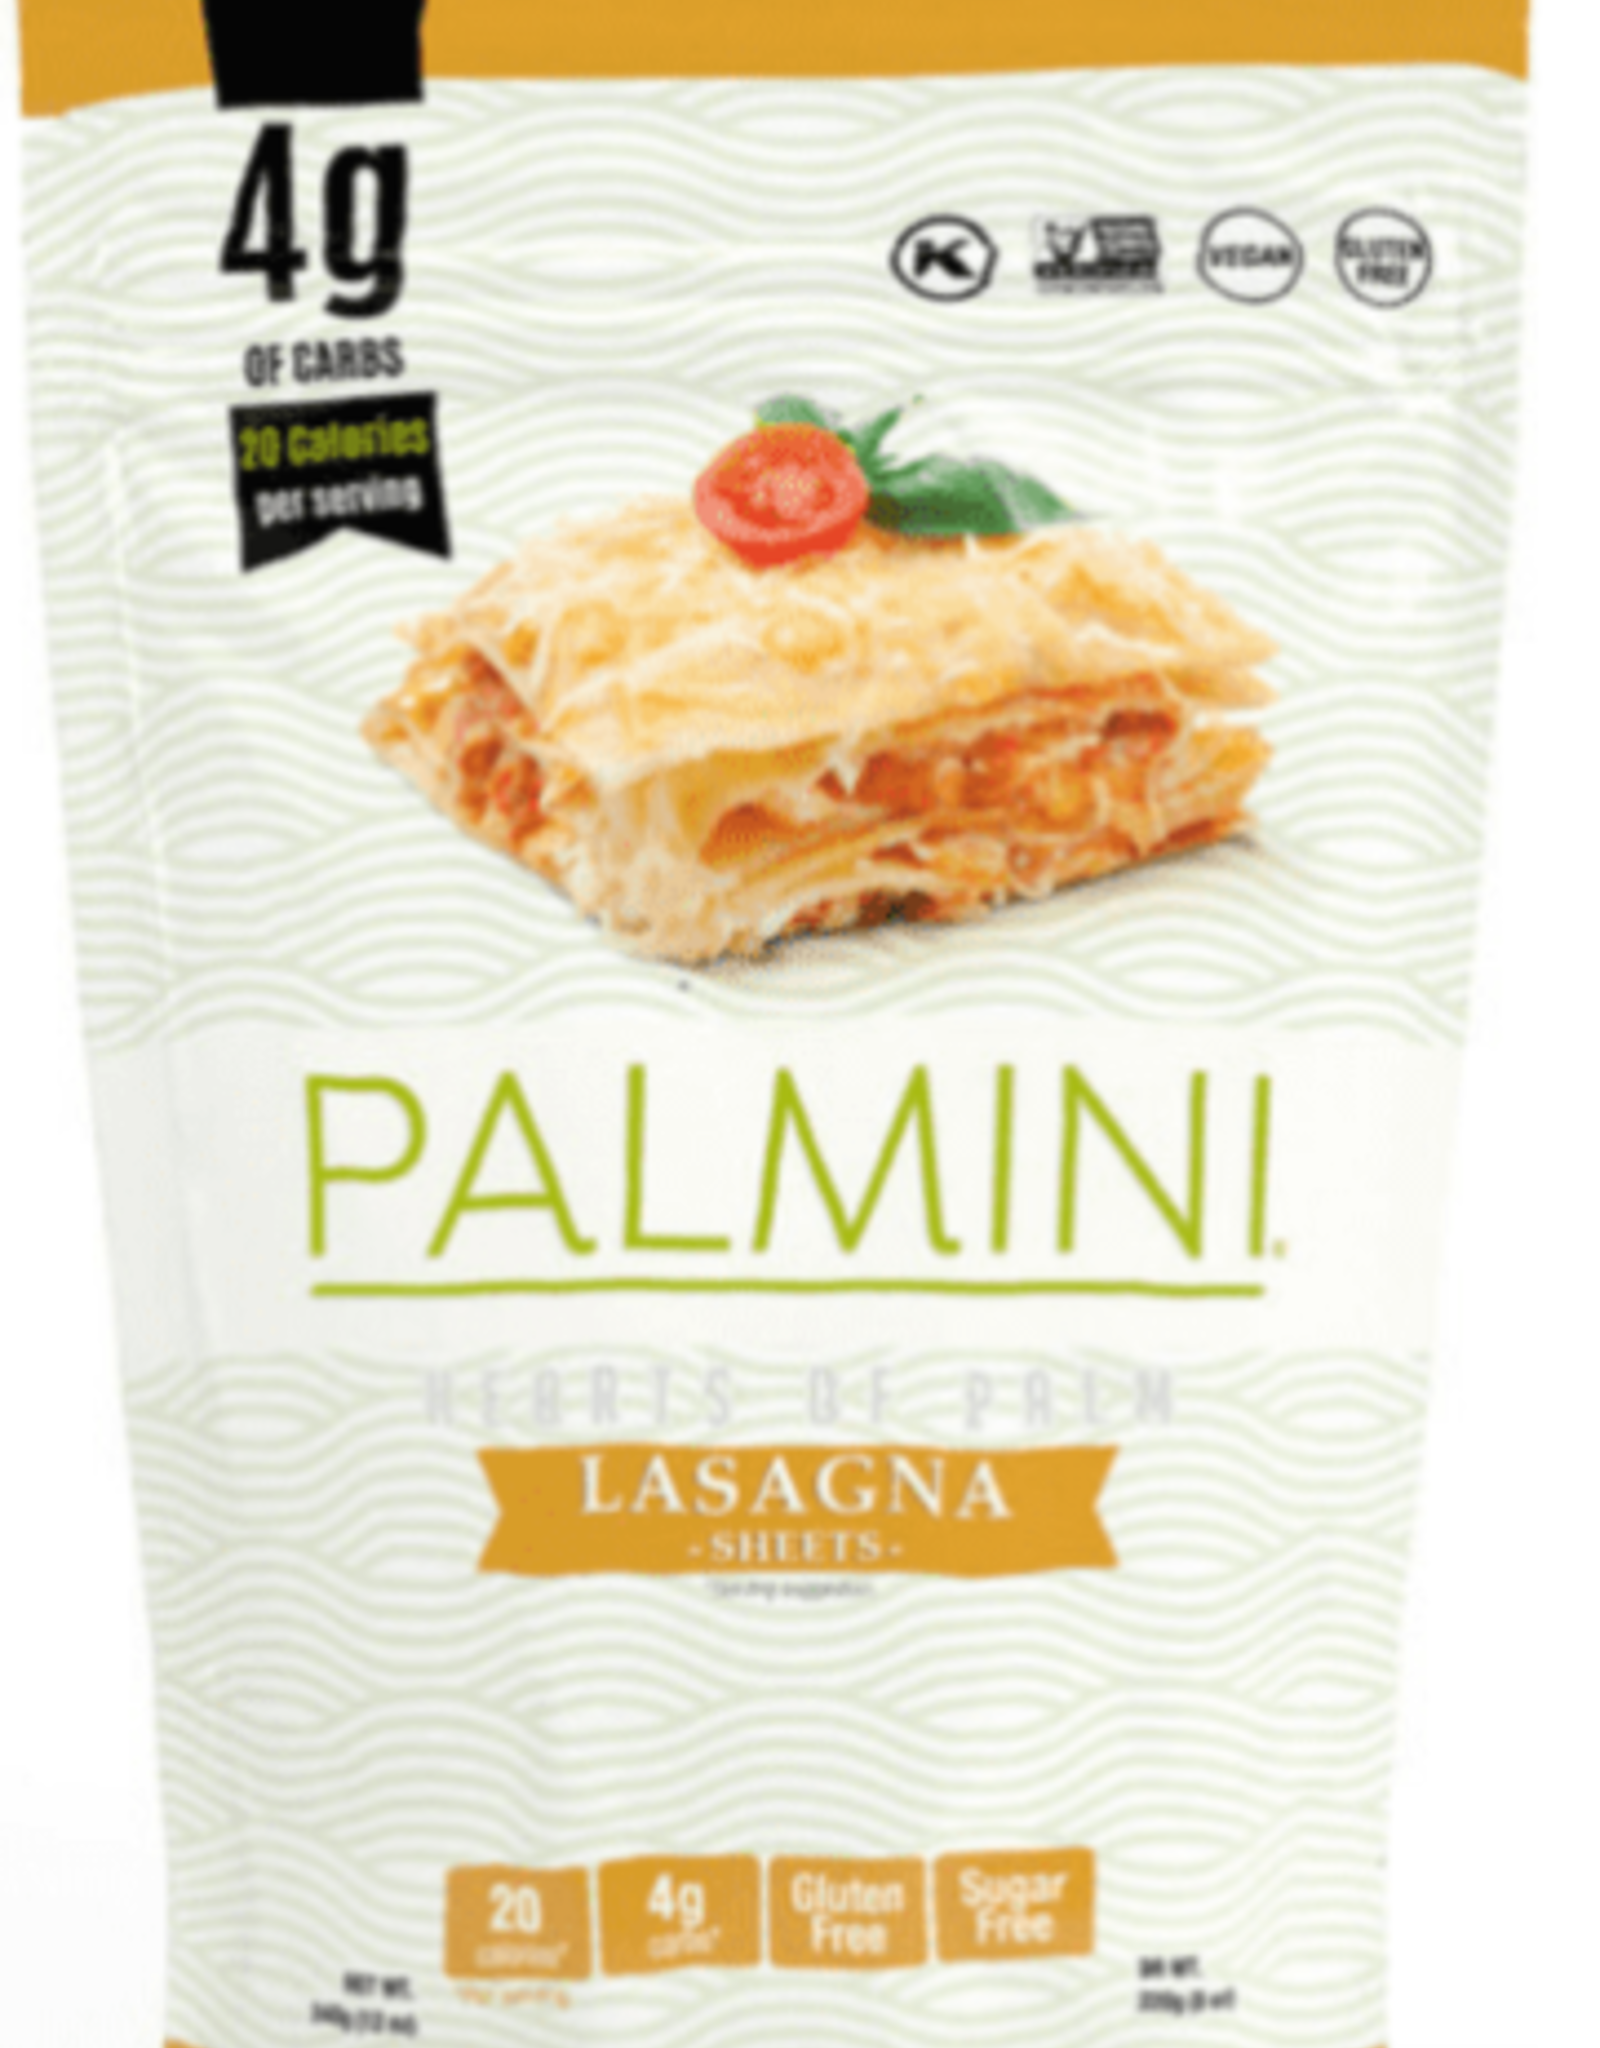 Palmini - Lasagna